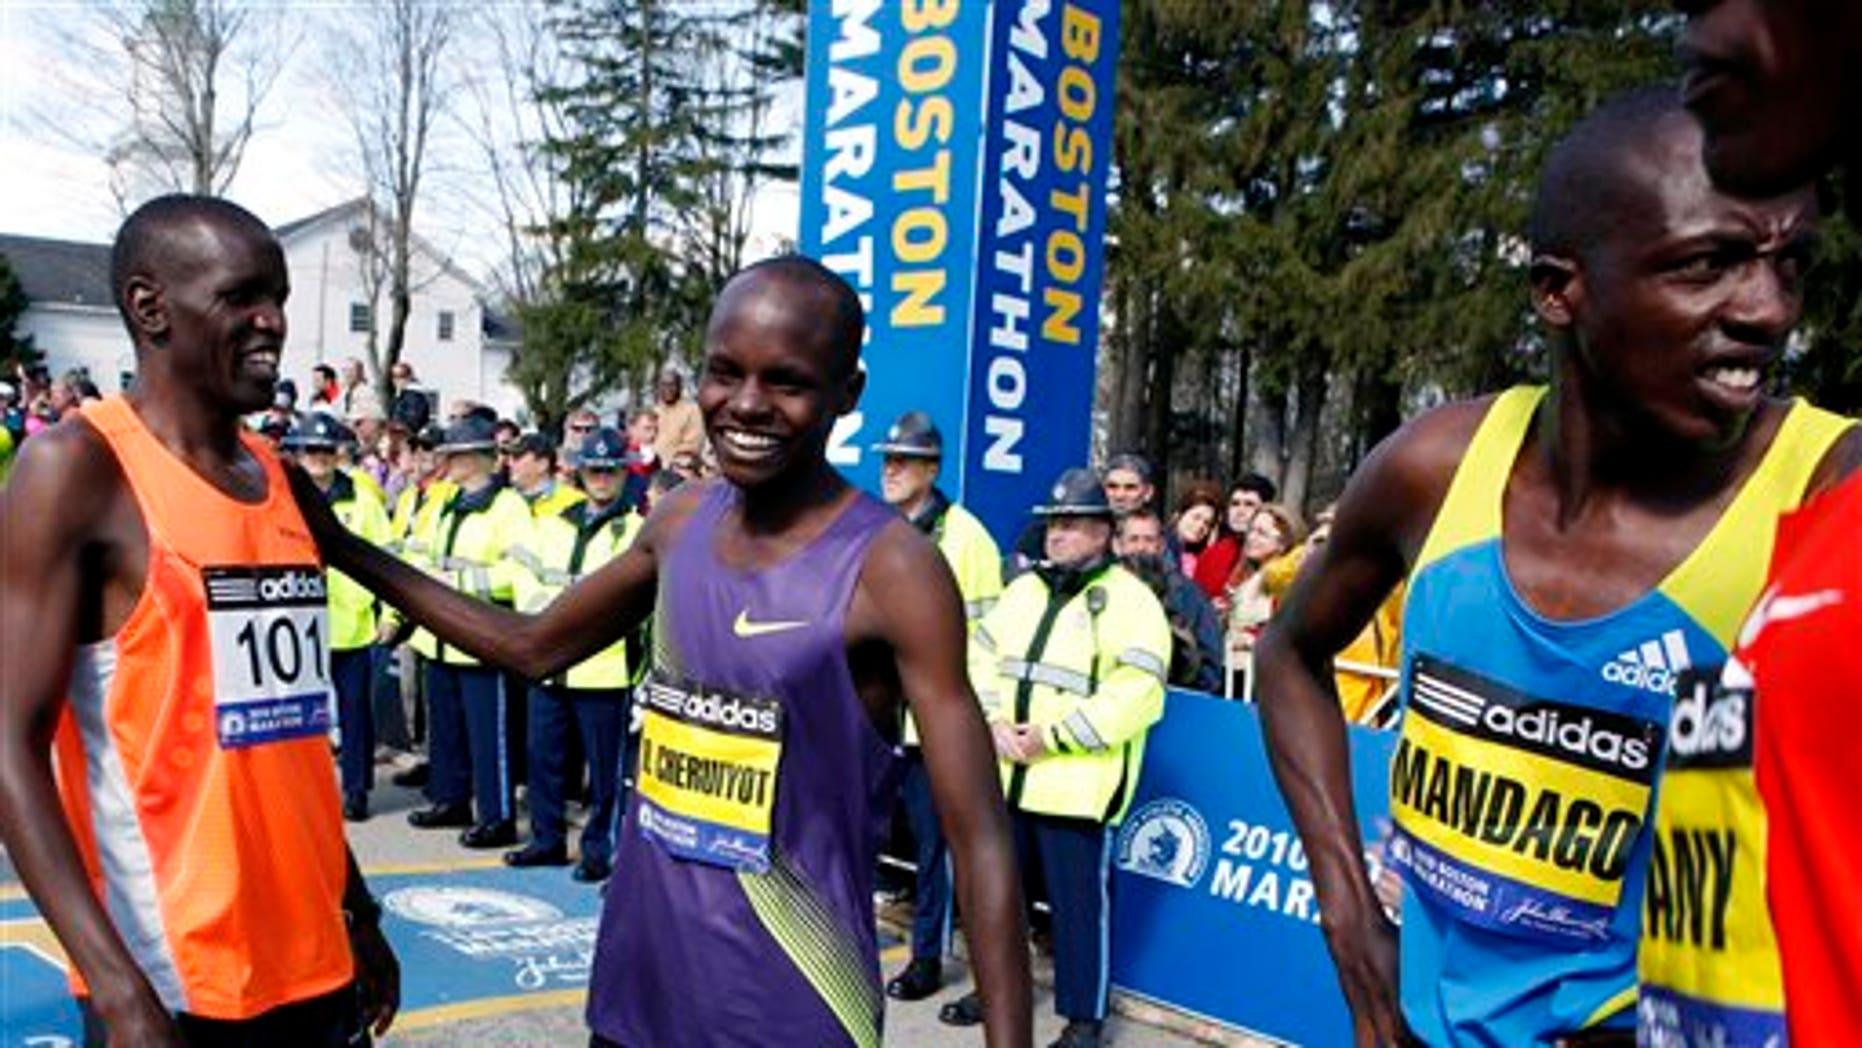 April 19: Kenyan runners, from left, James Koskei, Robert Cheruiyot, and David Mandago, wait for the start of the 114th running of the Boston Marathon in Hopkinton, Mass. Cheruiyot won the race.